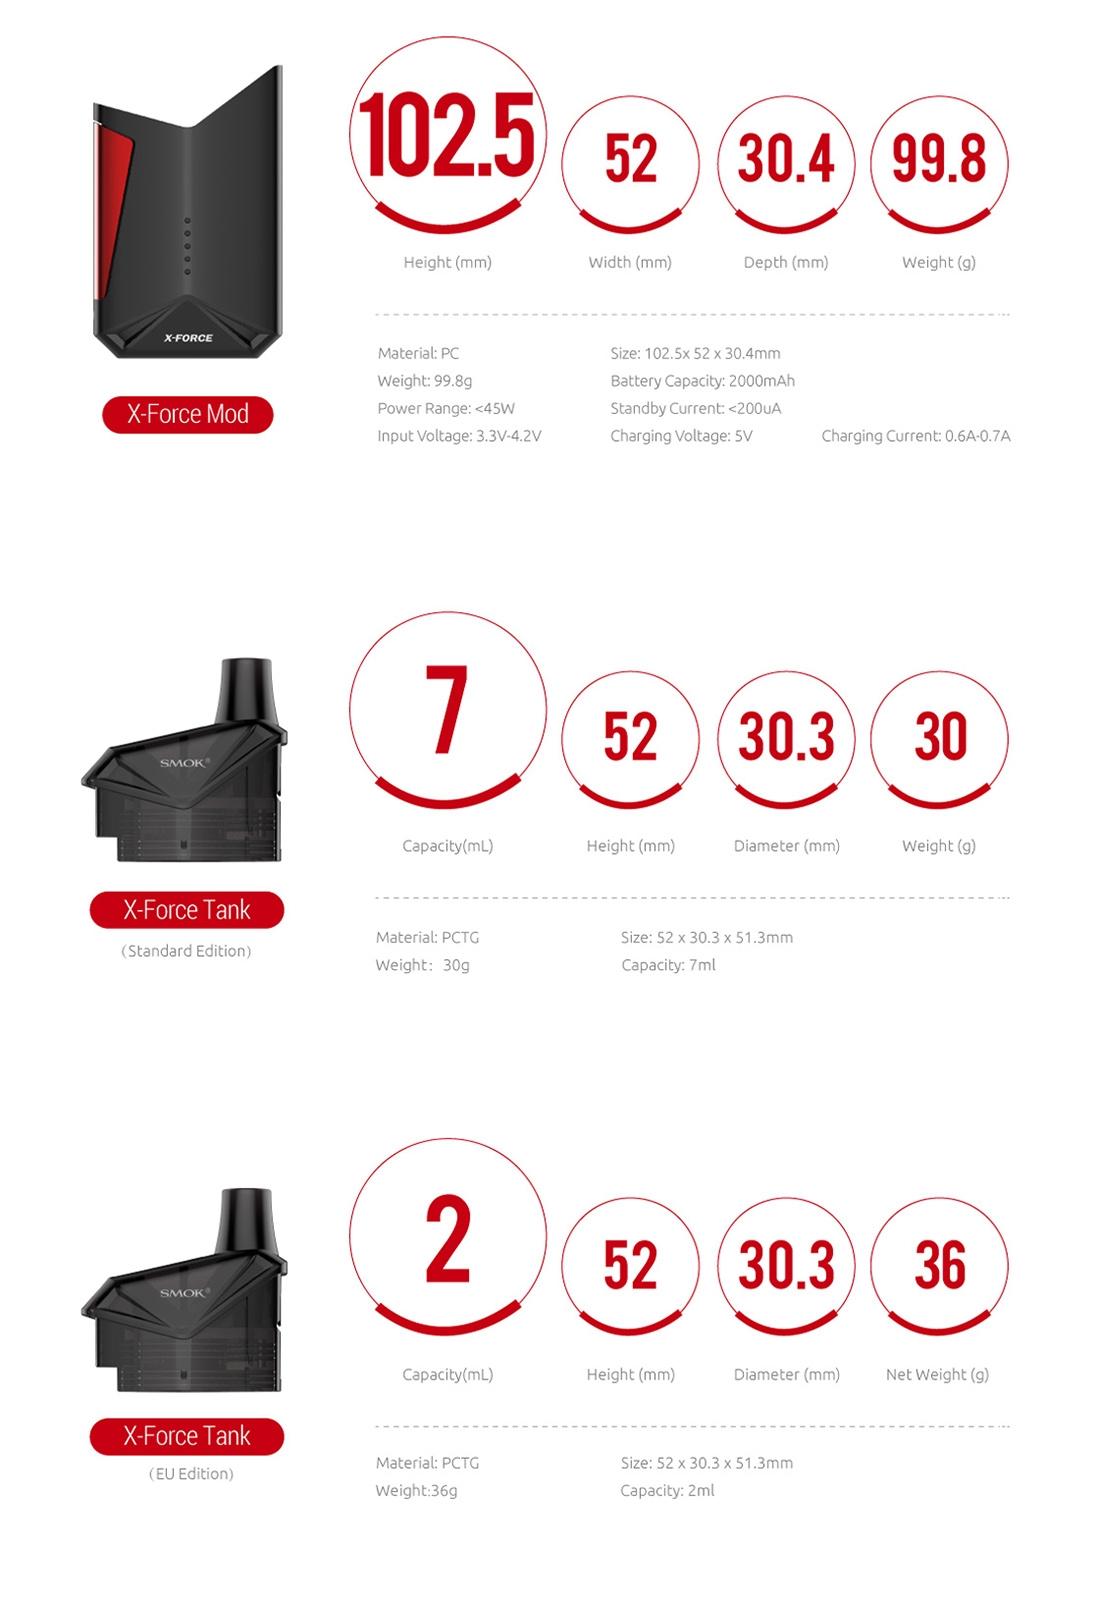 SMOK X-Force Kit Parameters